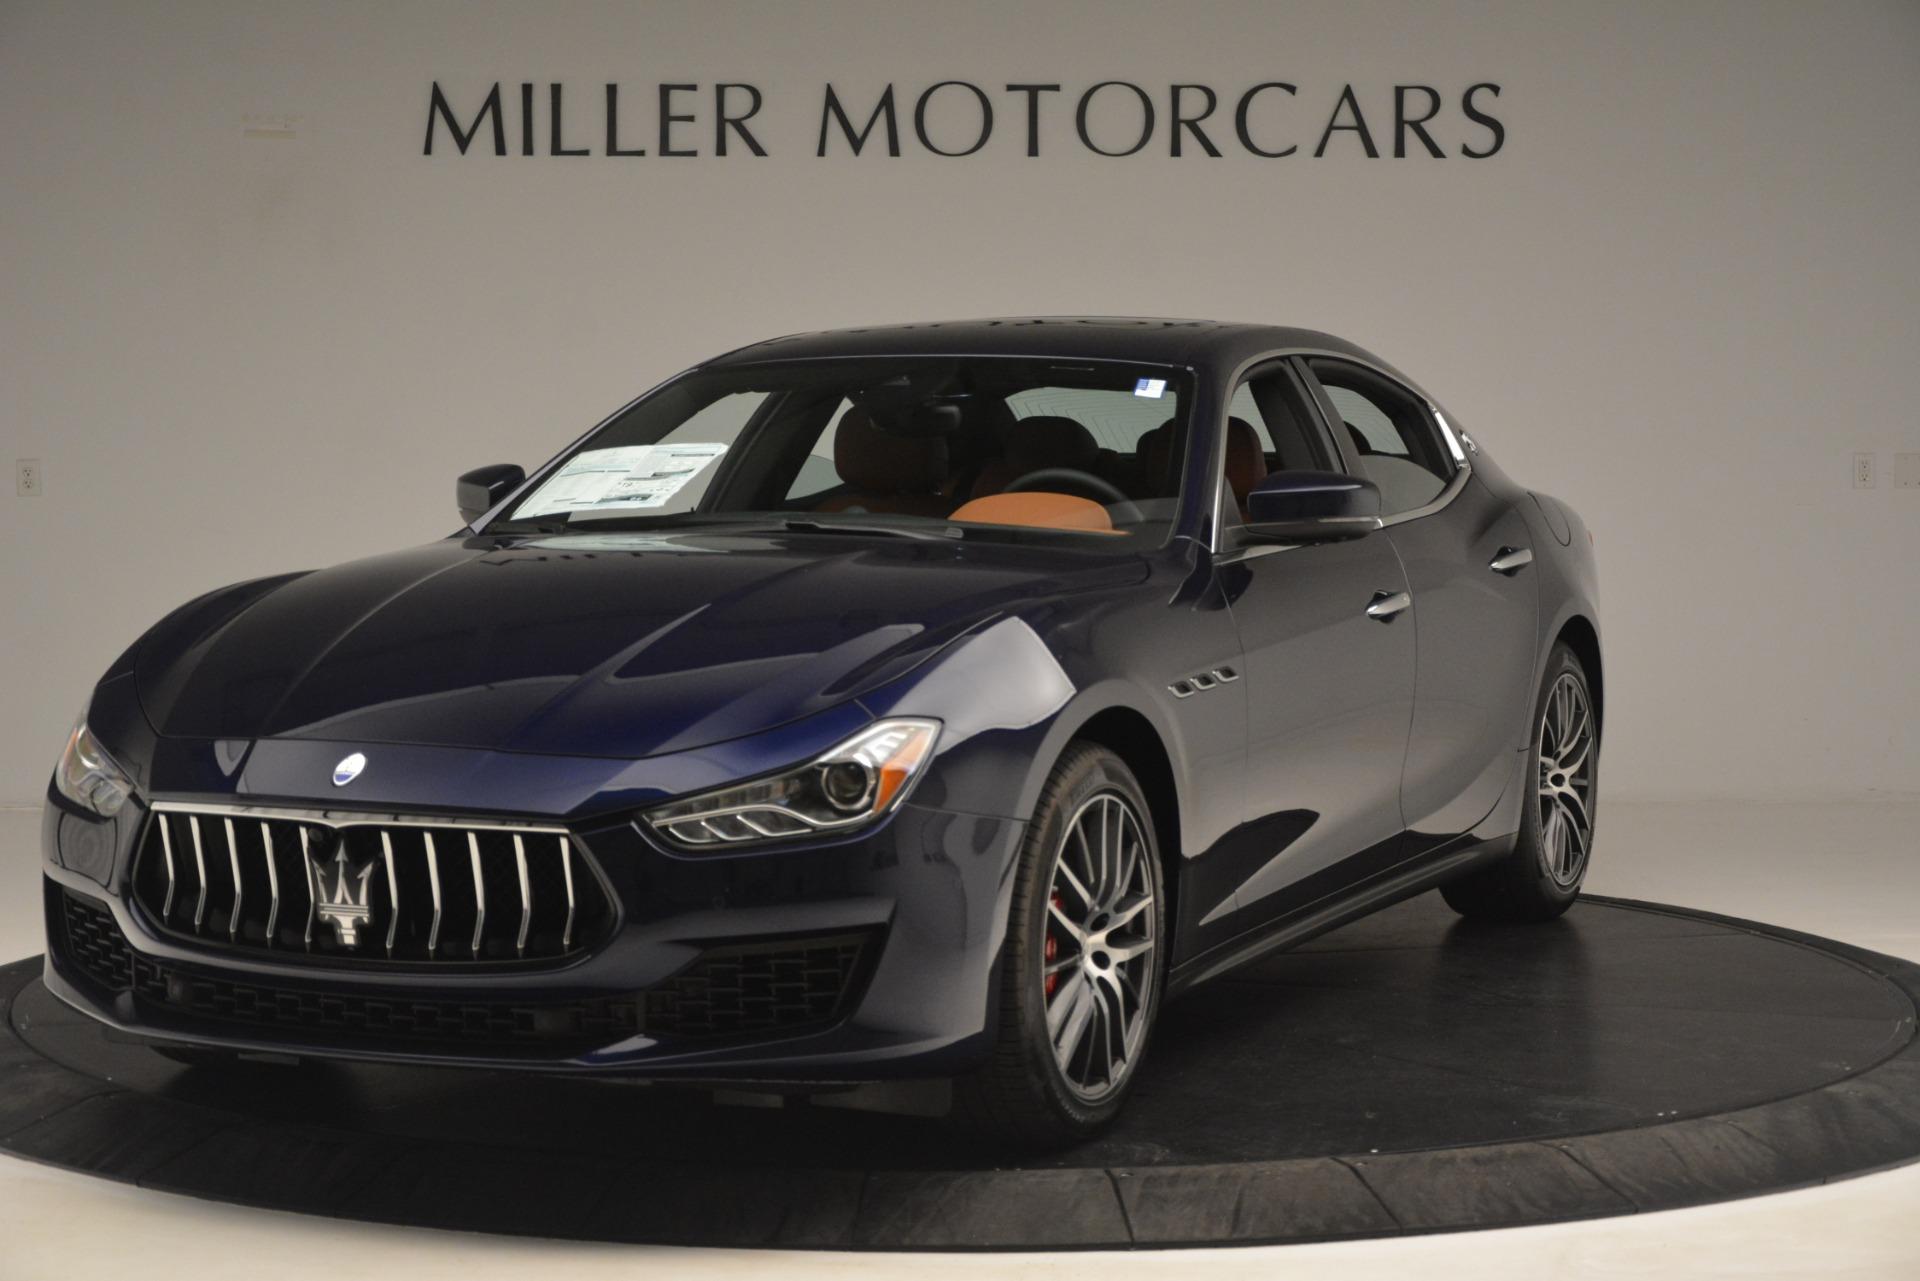 New 2019 Maserati Ghibli S Q4 For Sale In Greenwich, CT. Alfa Romeo of Greenwich, M2290 3106_main